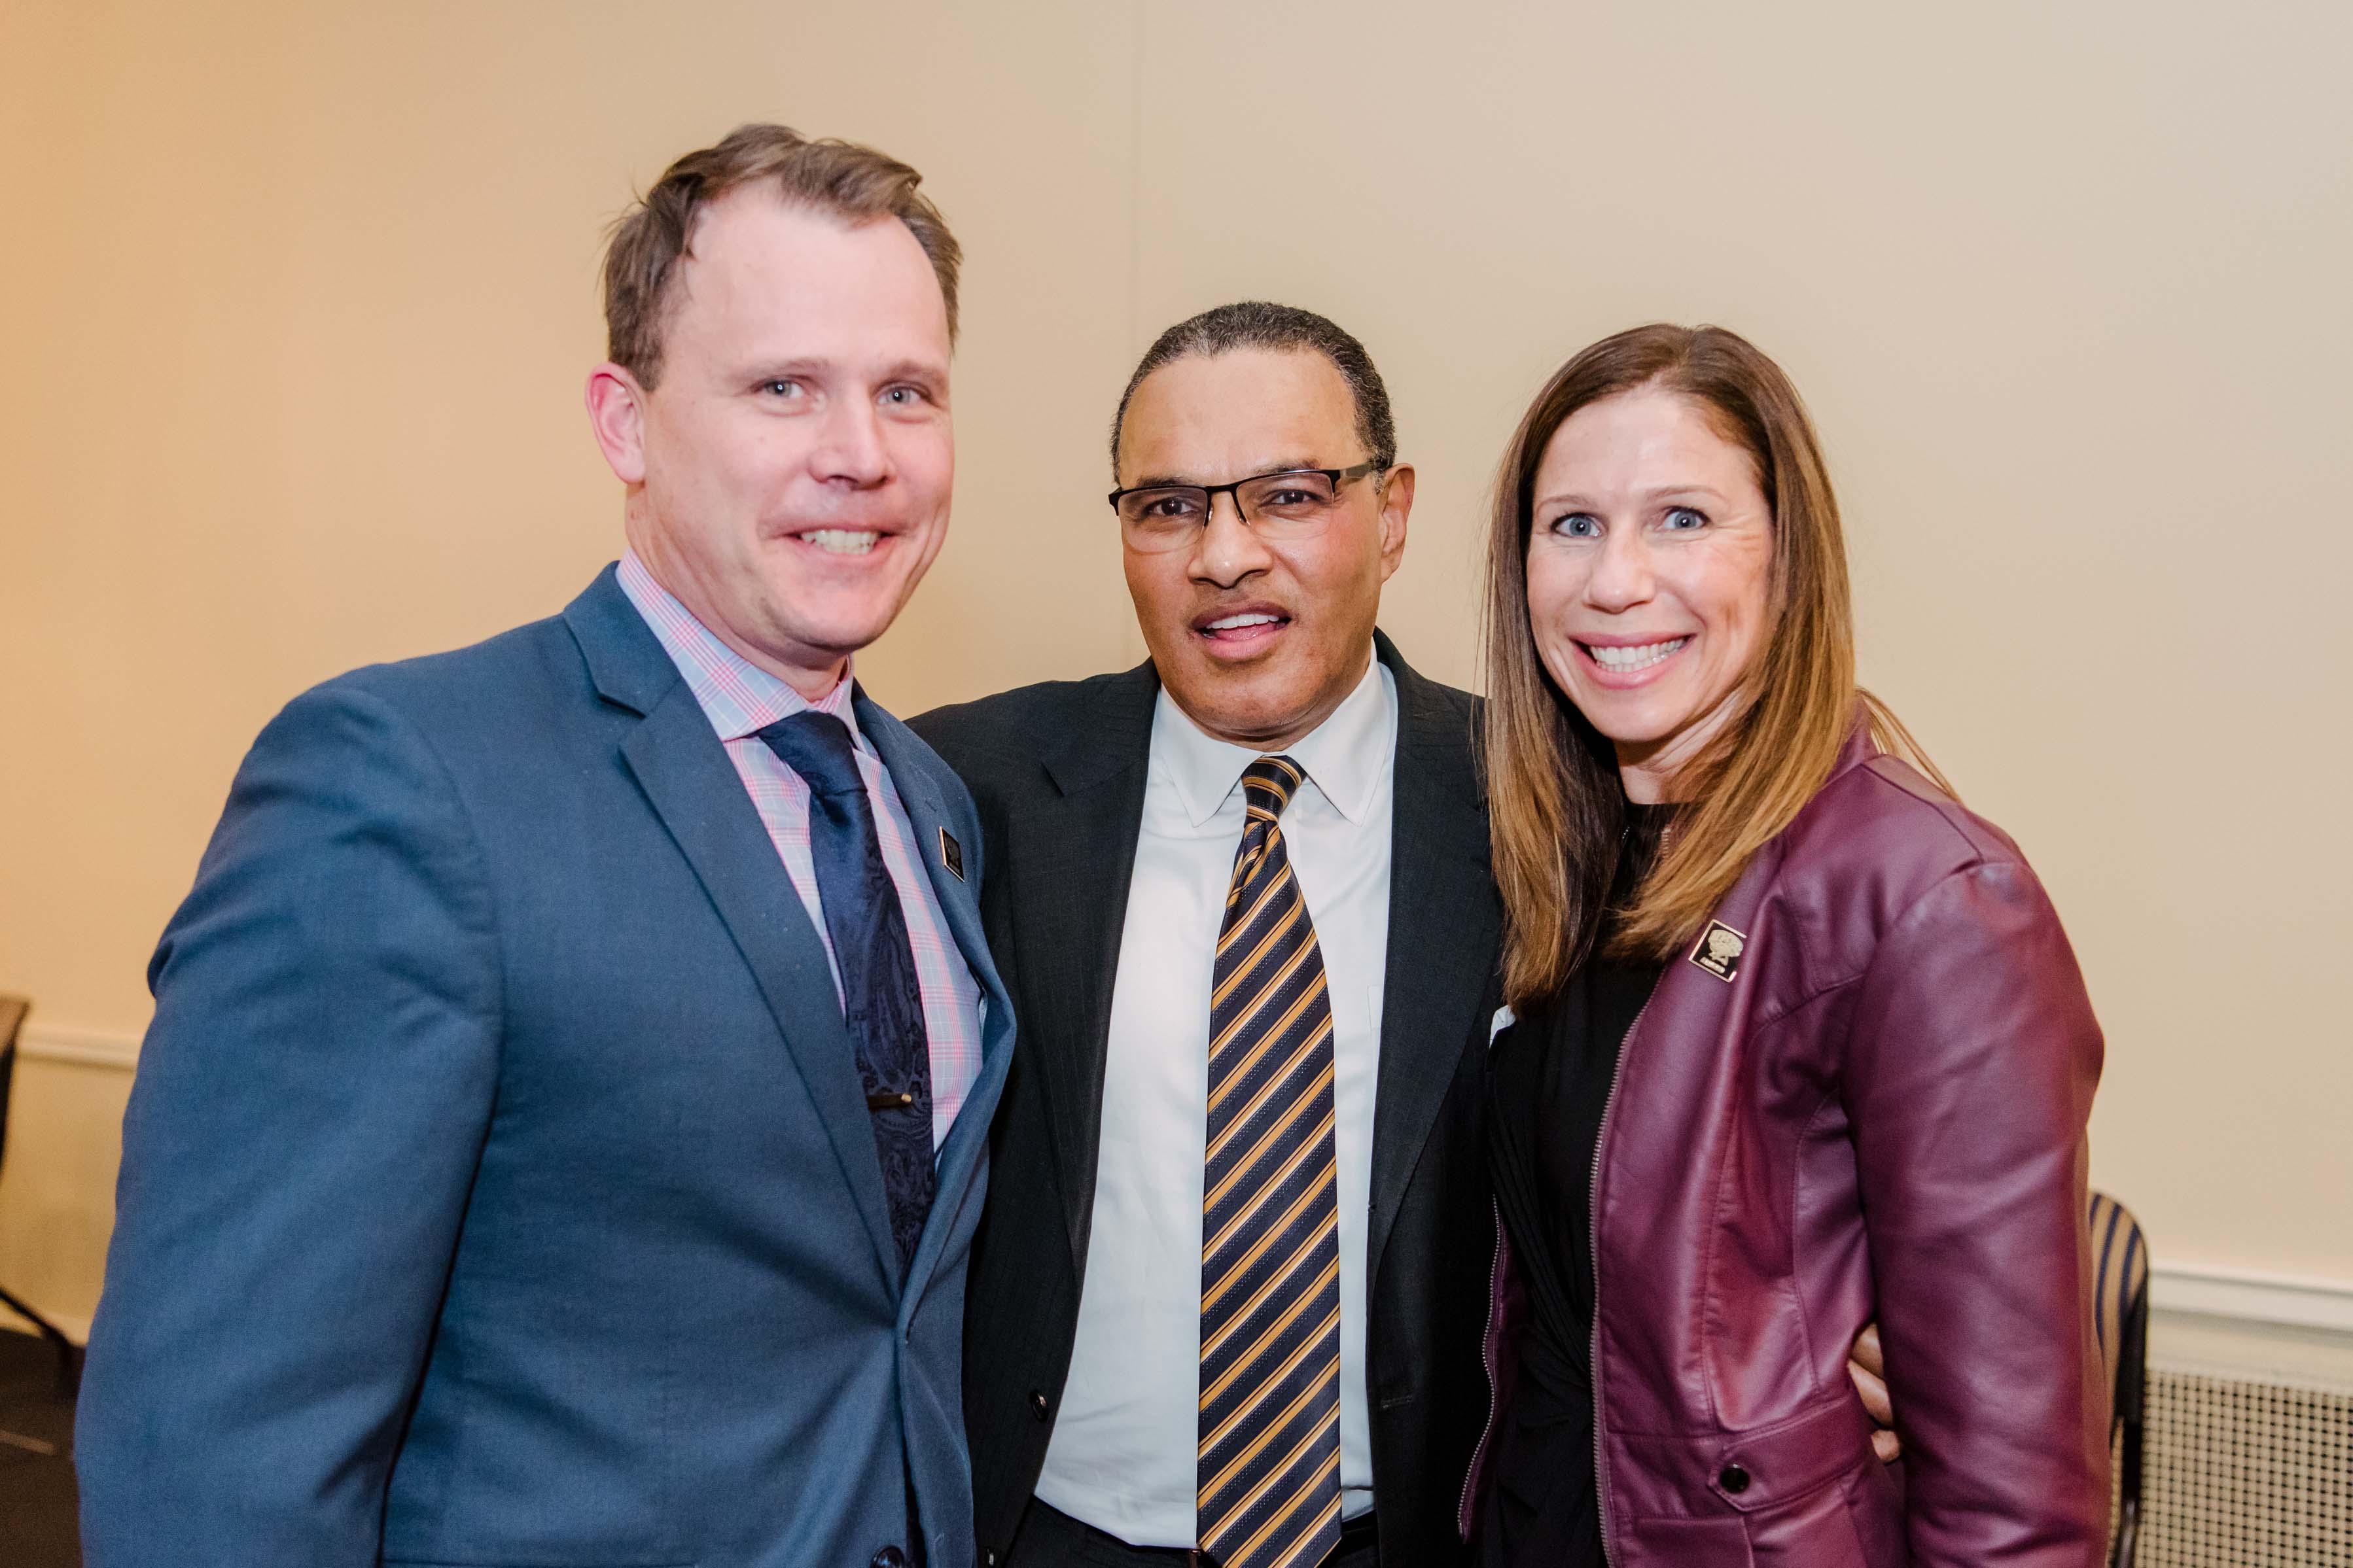 Hrabowski poses with couple at Annapolis Alumni Reception